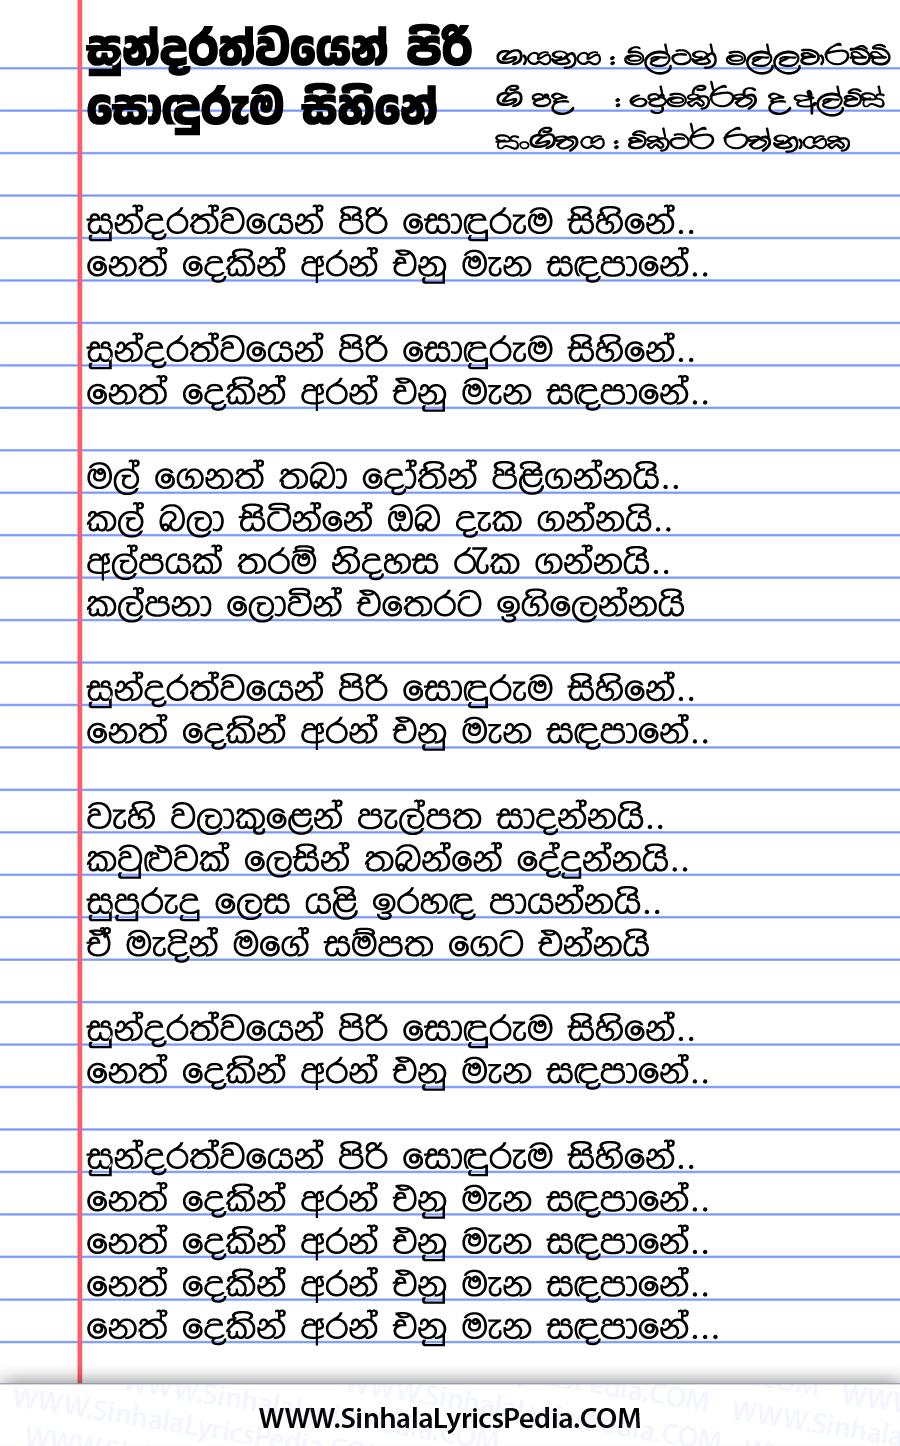 Sundarathwayen Piri Sonduruma Sihine Song Lyrics